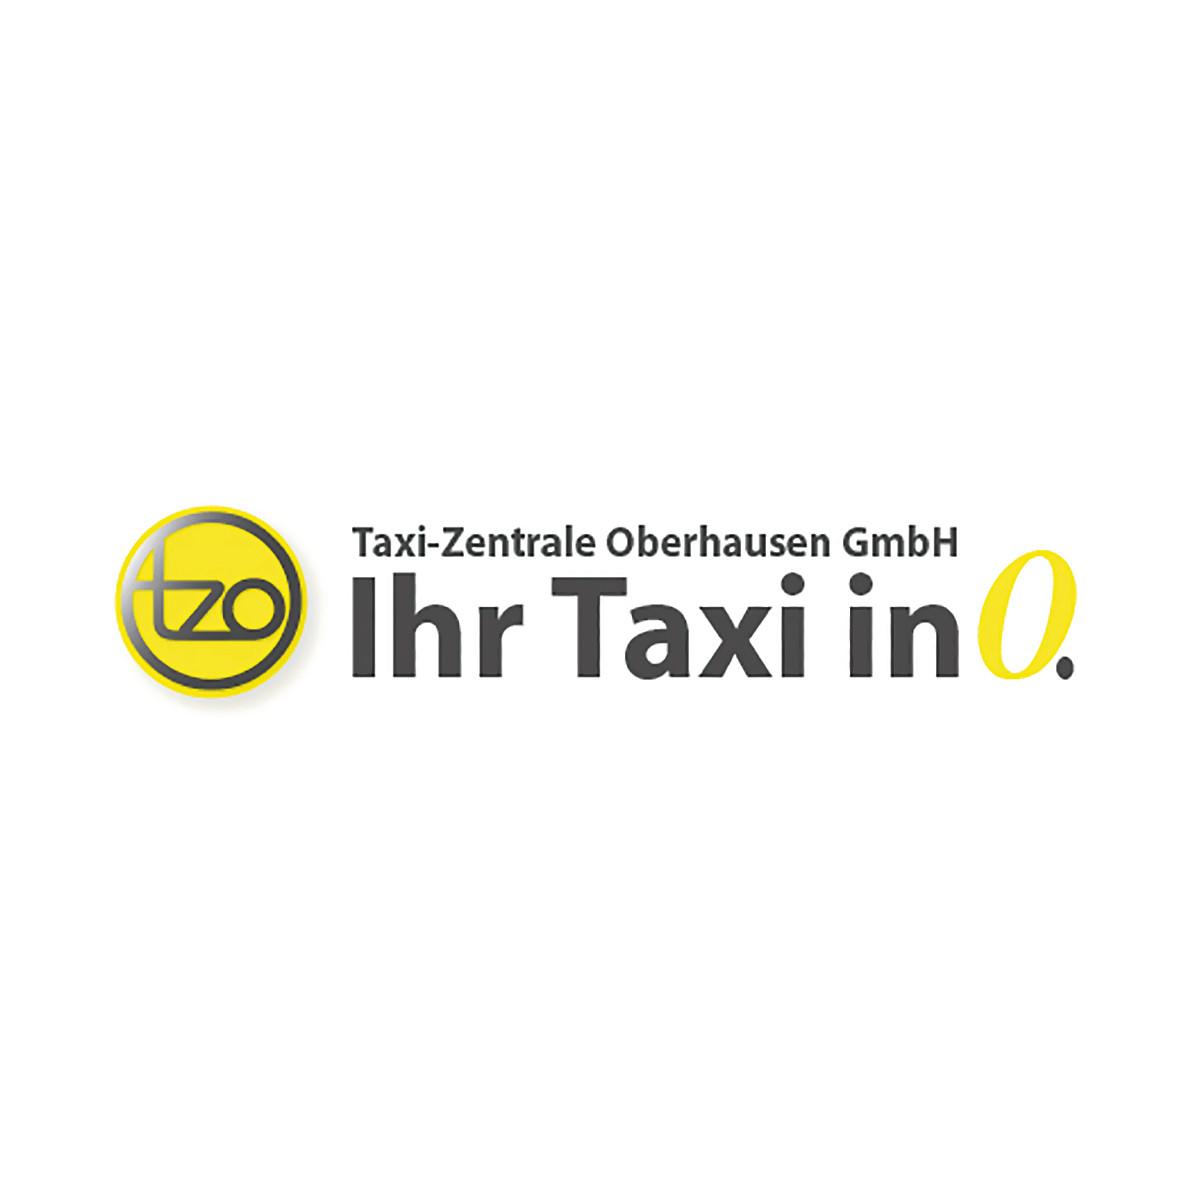 Bild zu Taxi Zentrale Oberhausen GmbH in Oberhausen im Rheinland